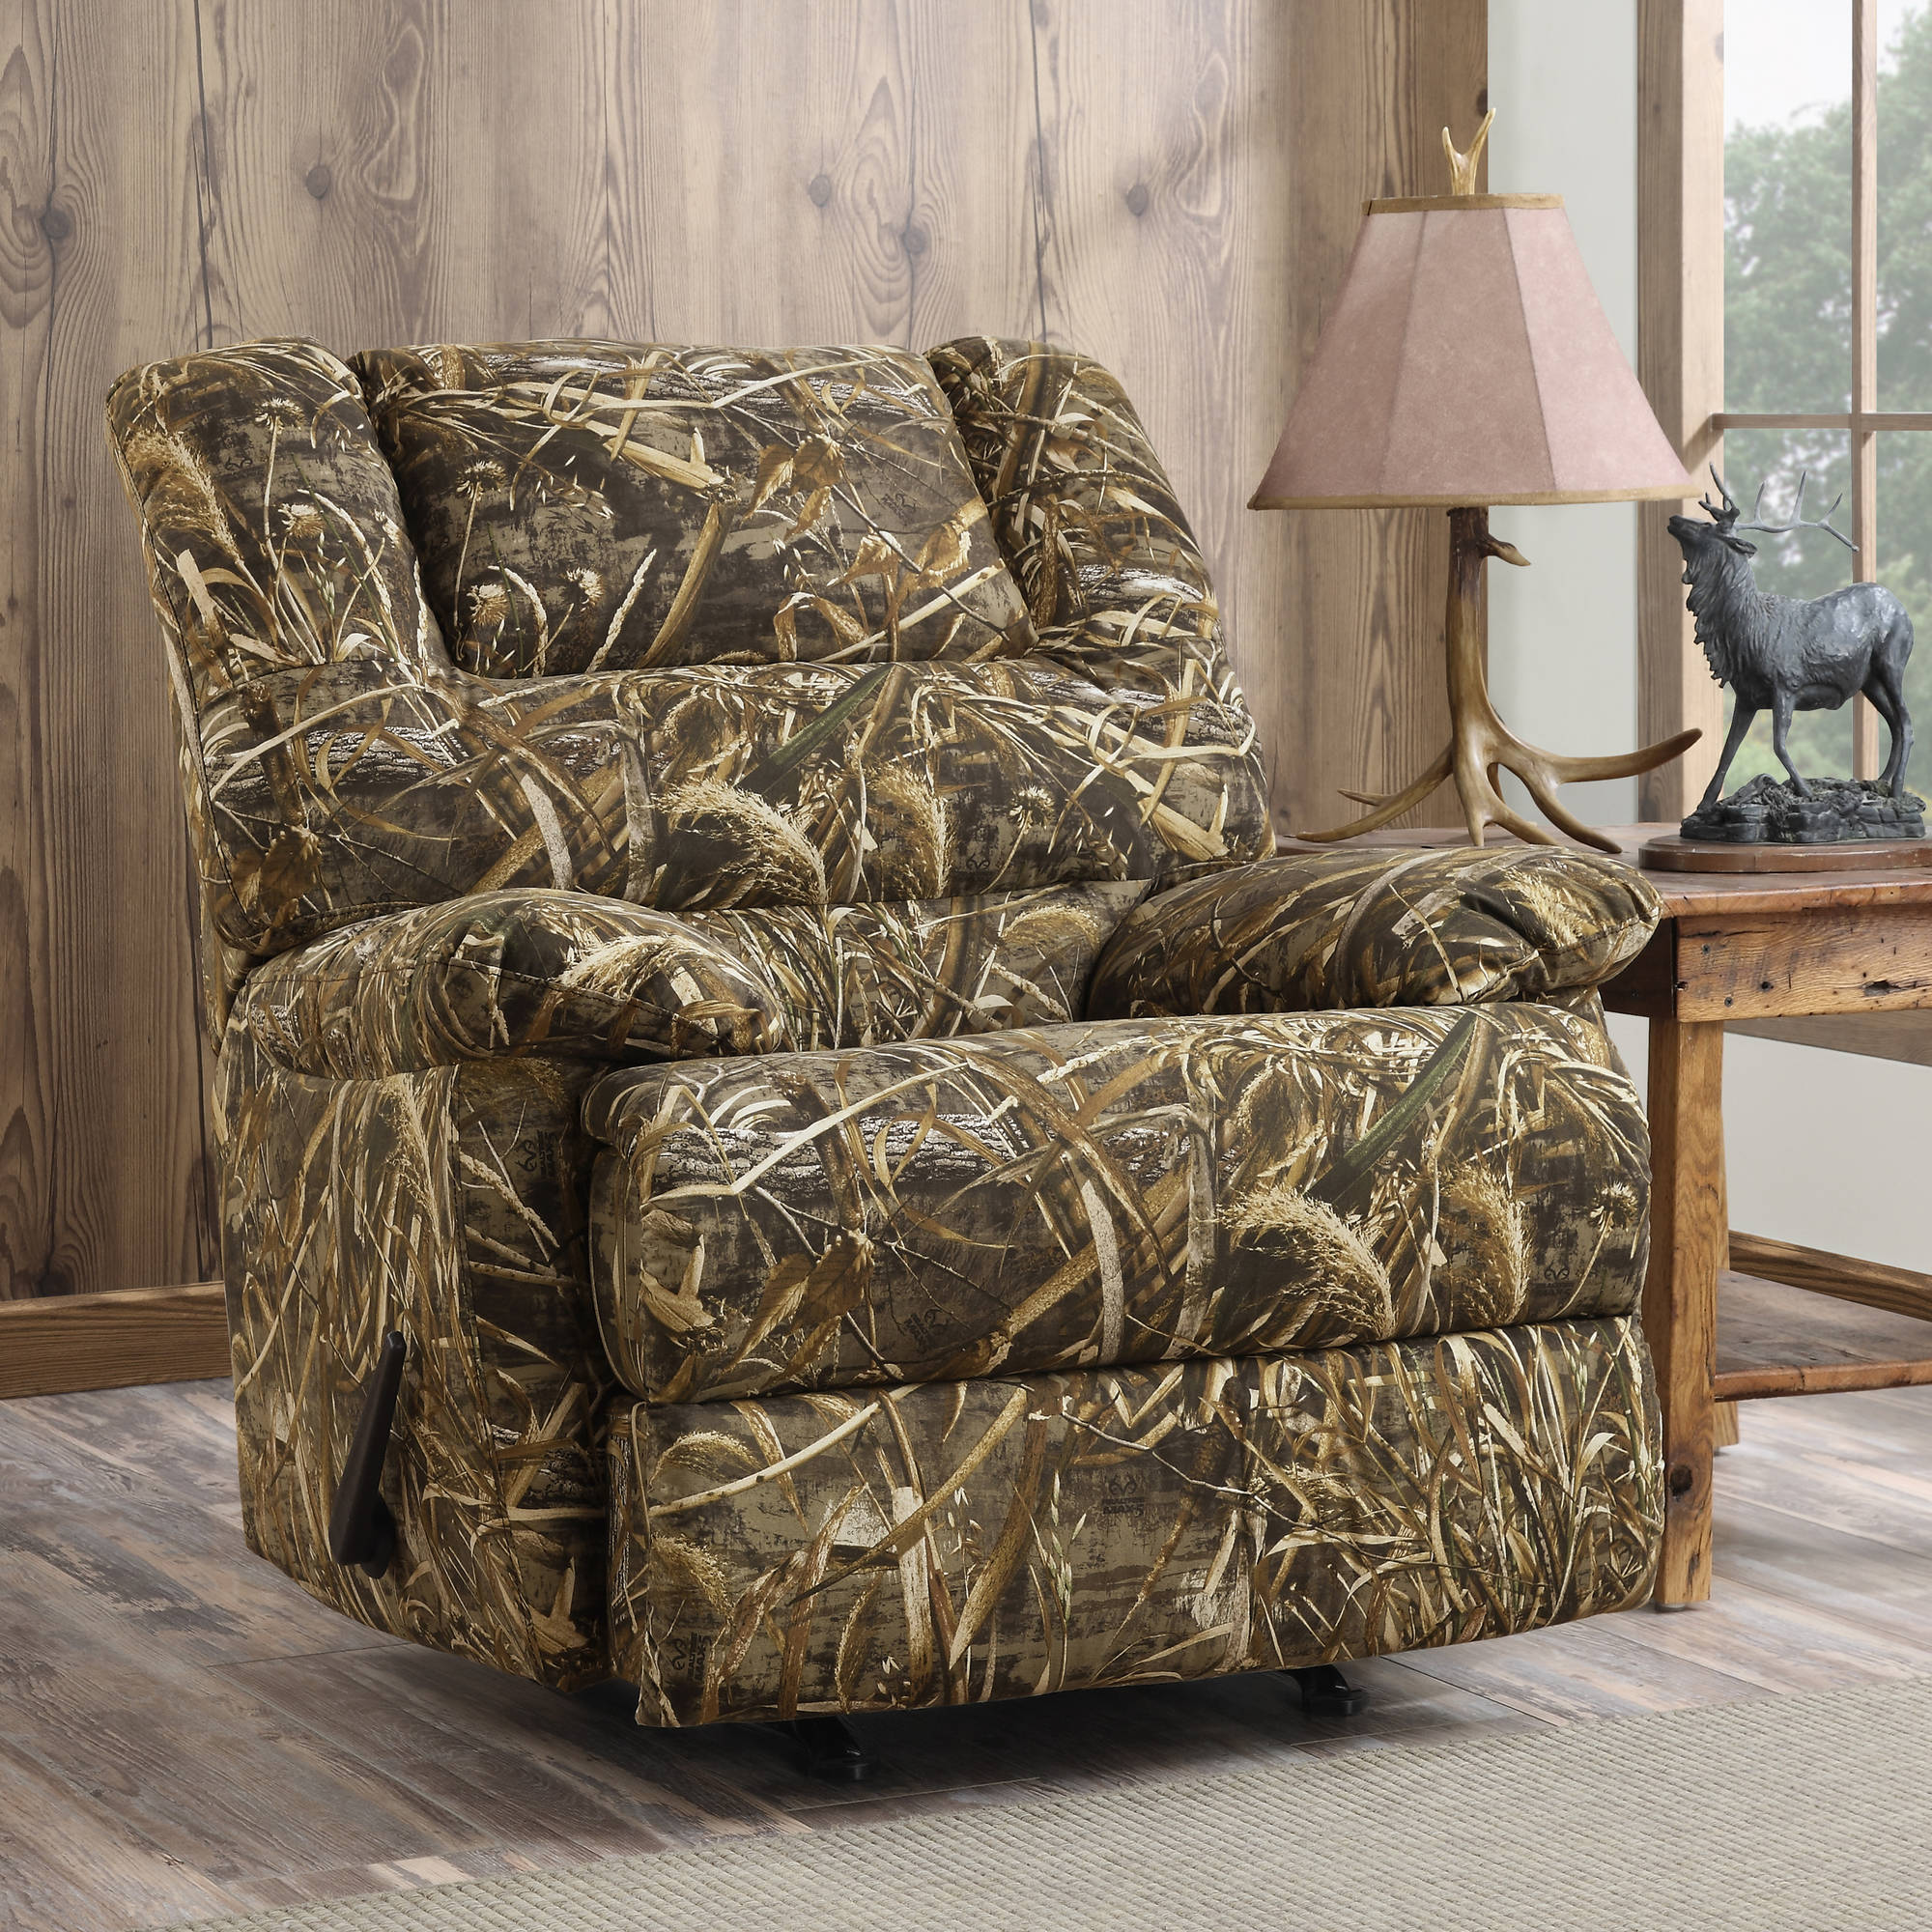 Dorel Living Realtree Camouflage Deluxe Recliner, Camo - Walmart.Com